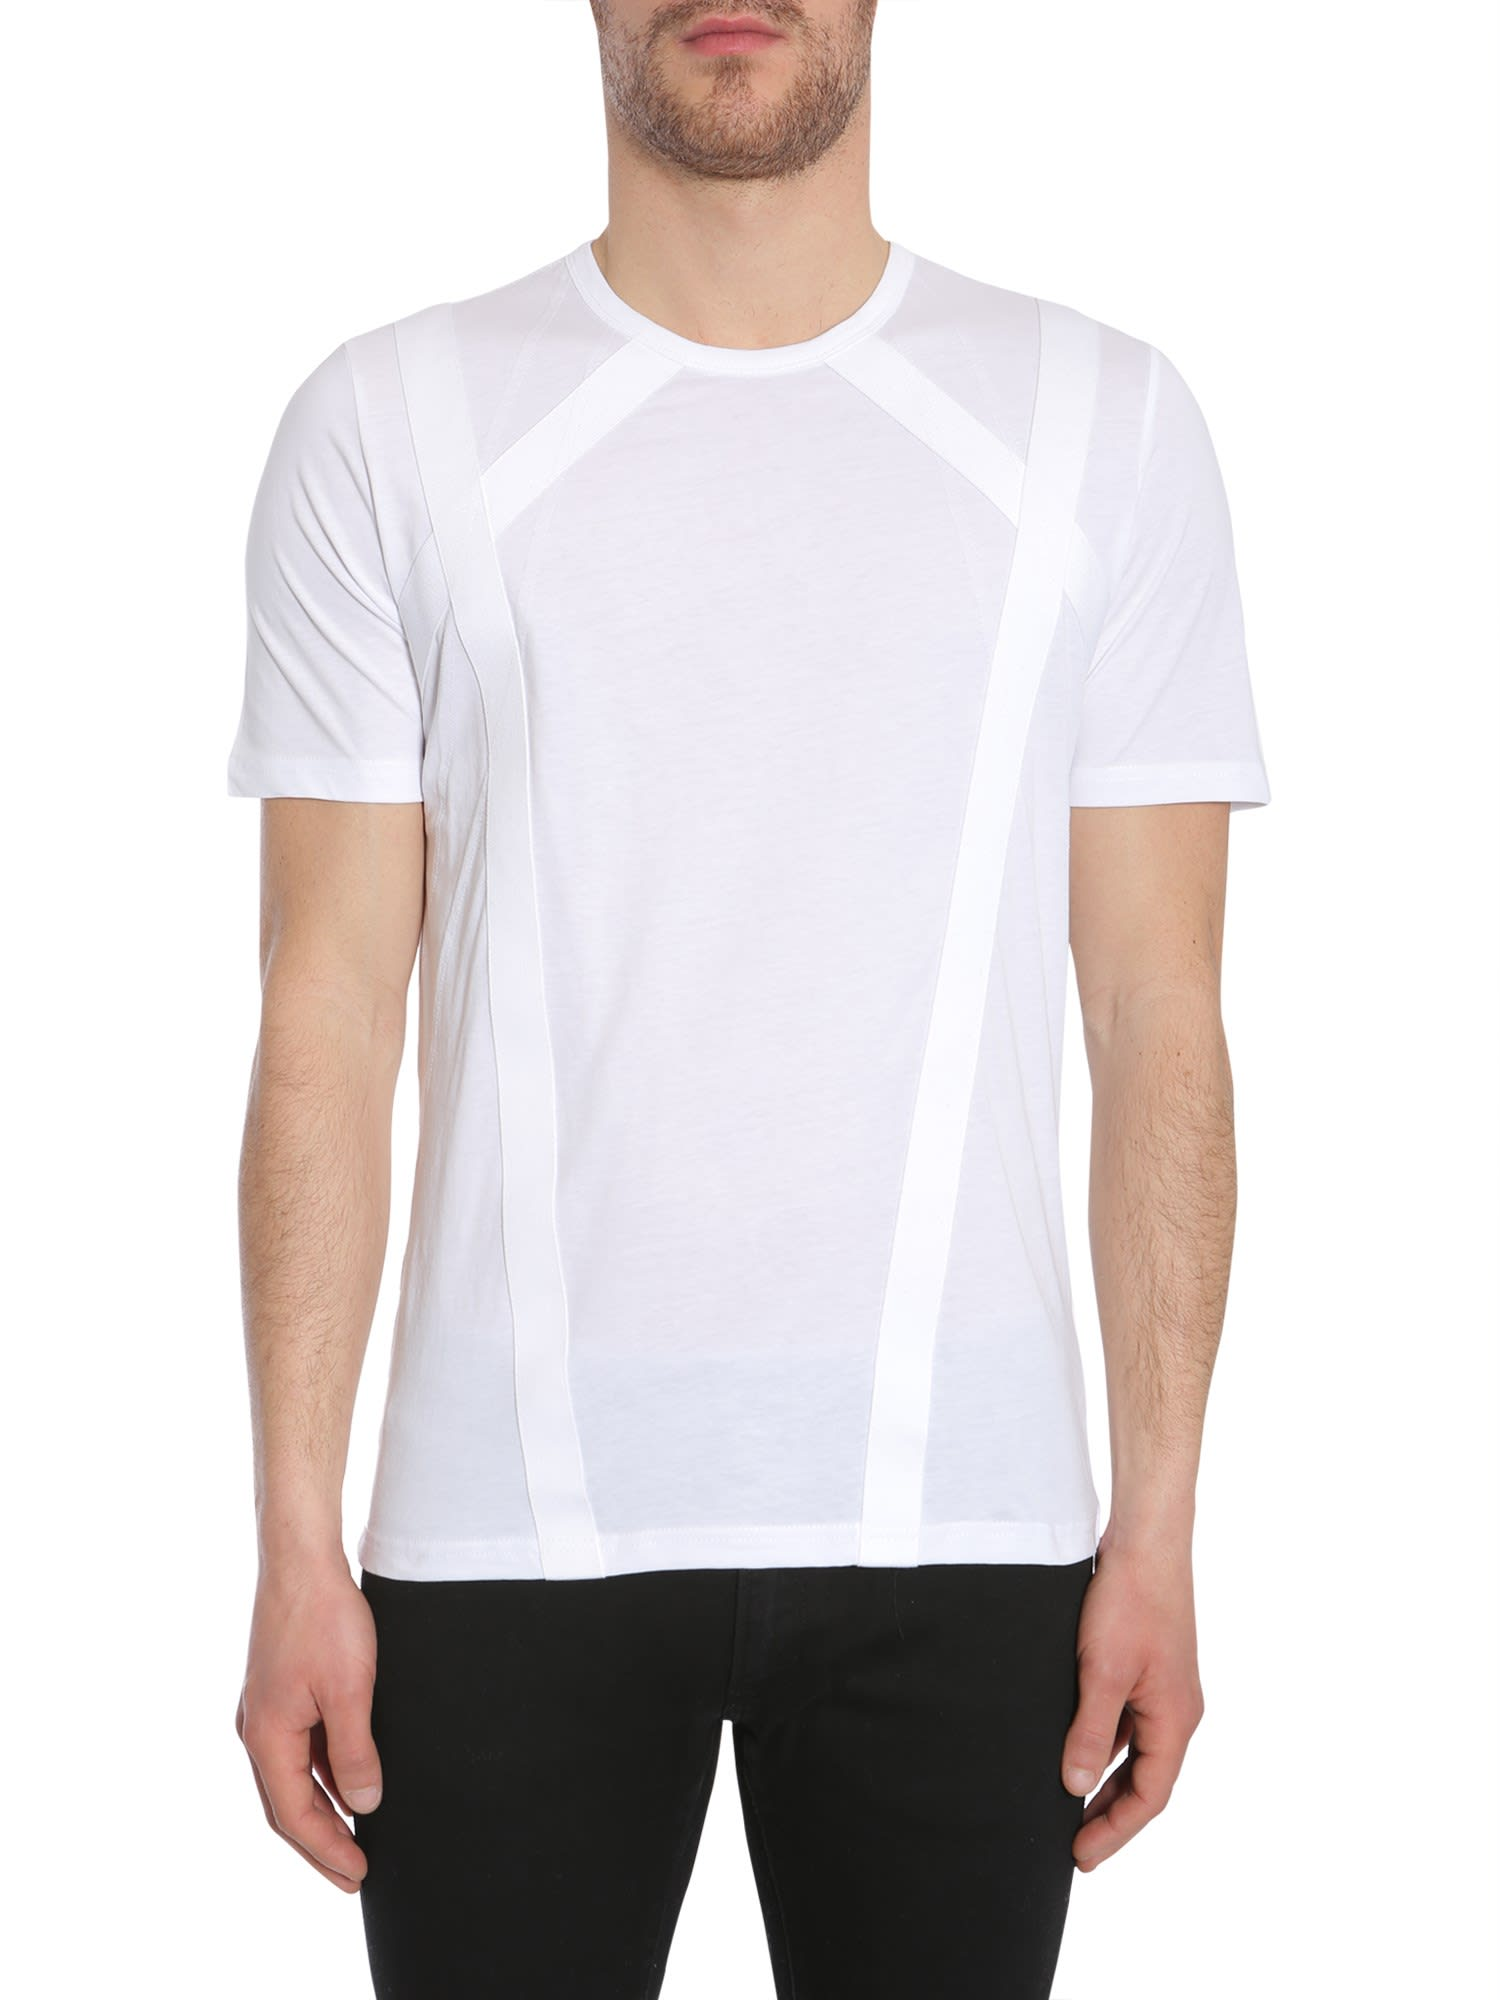 Tsquare T-shirt